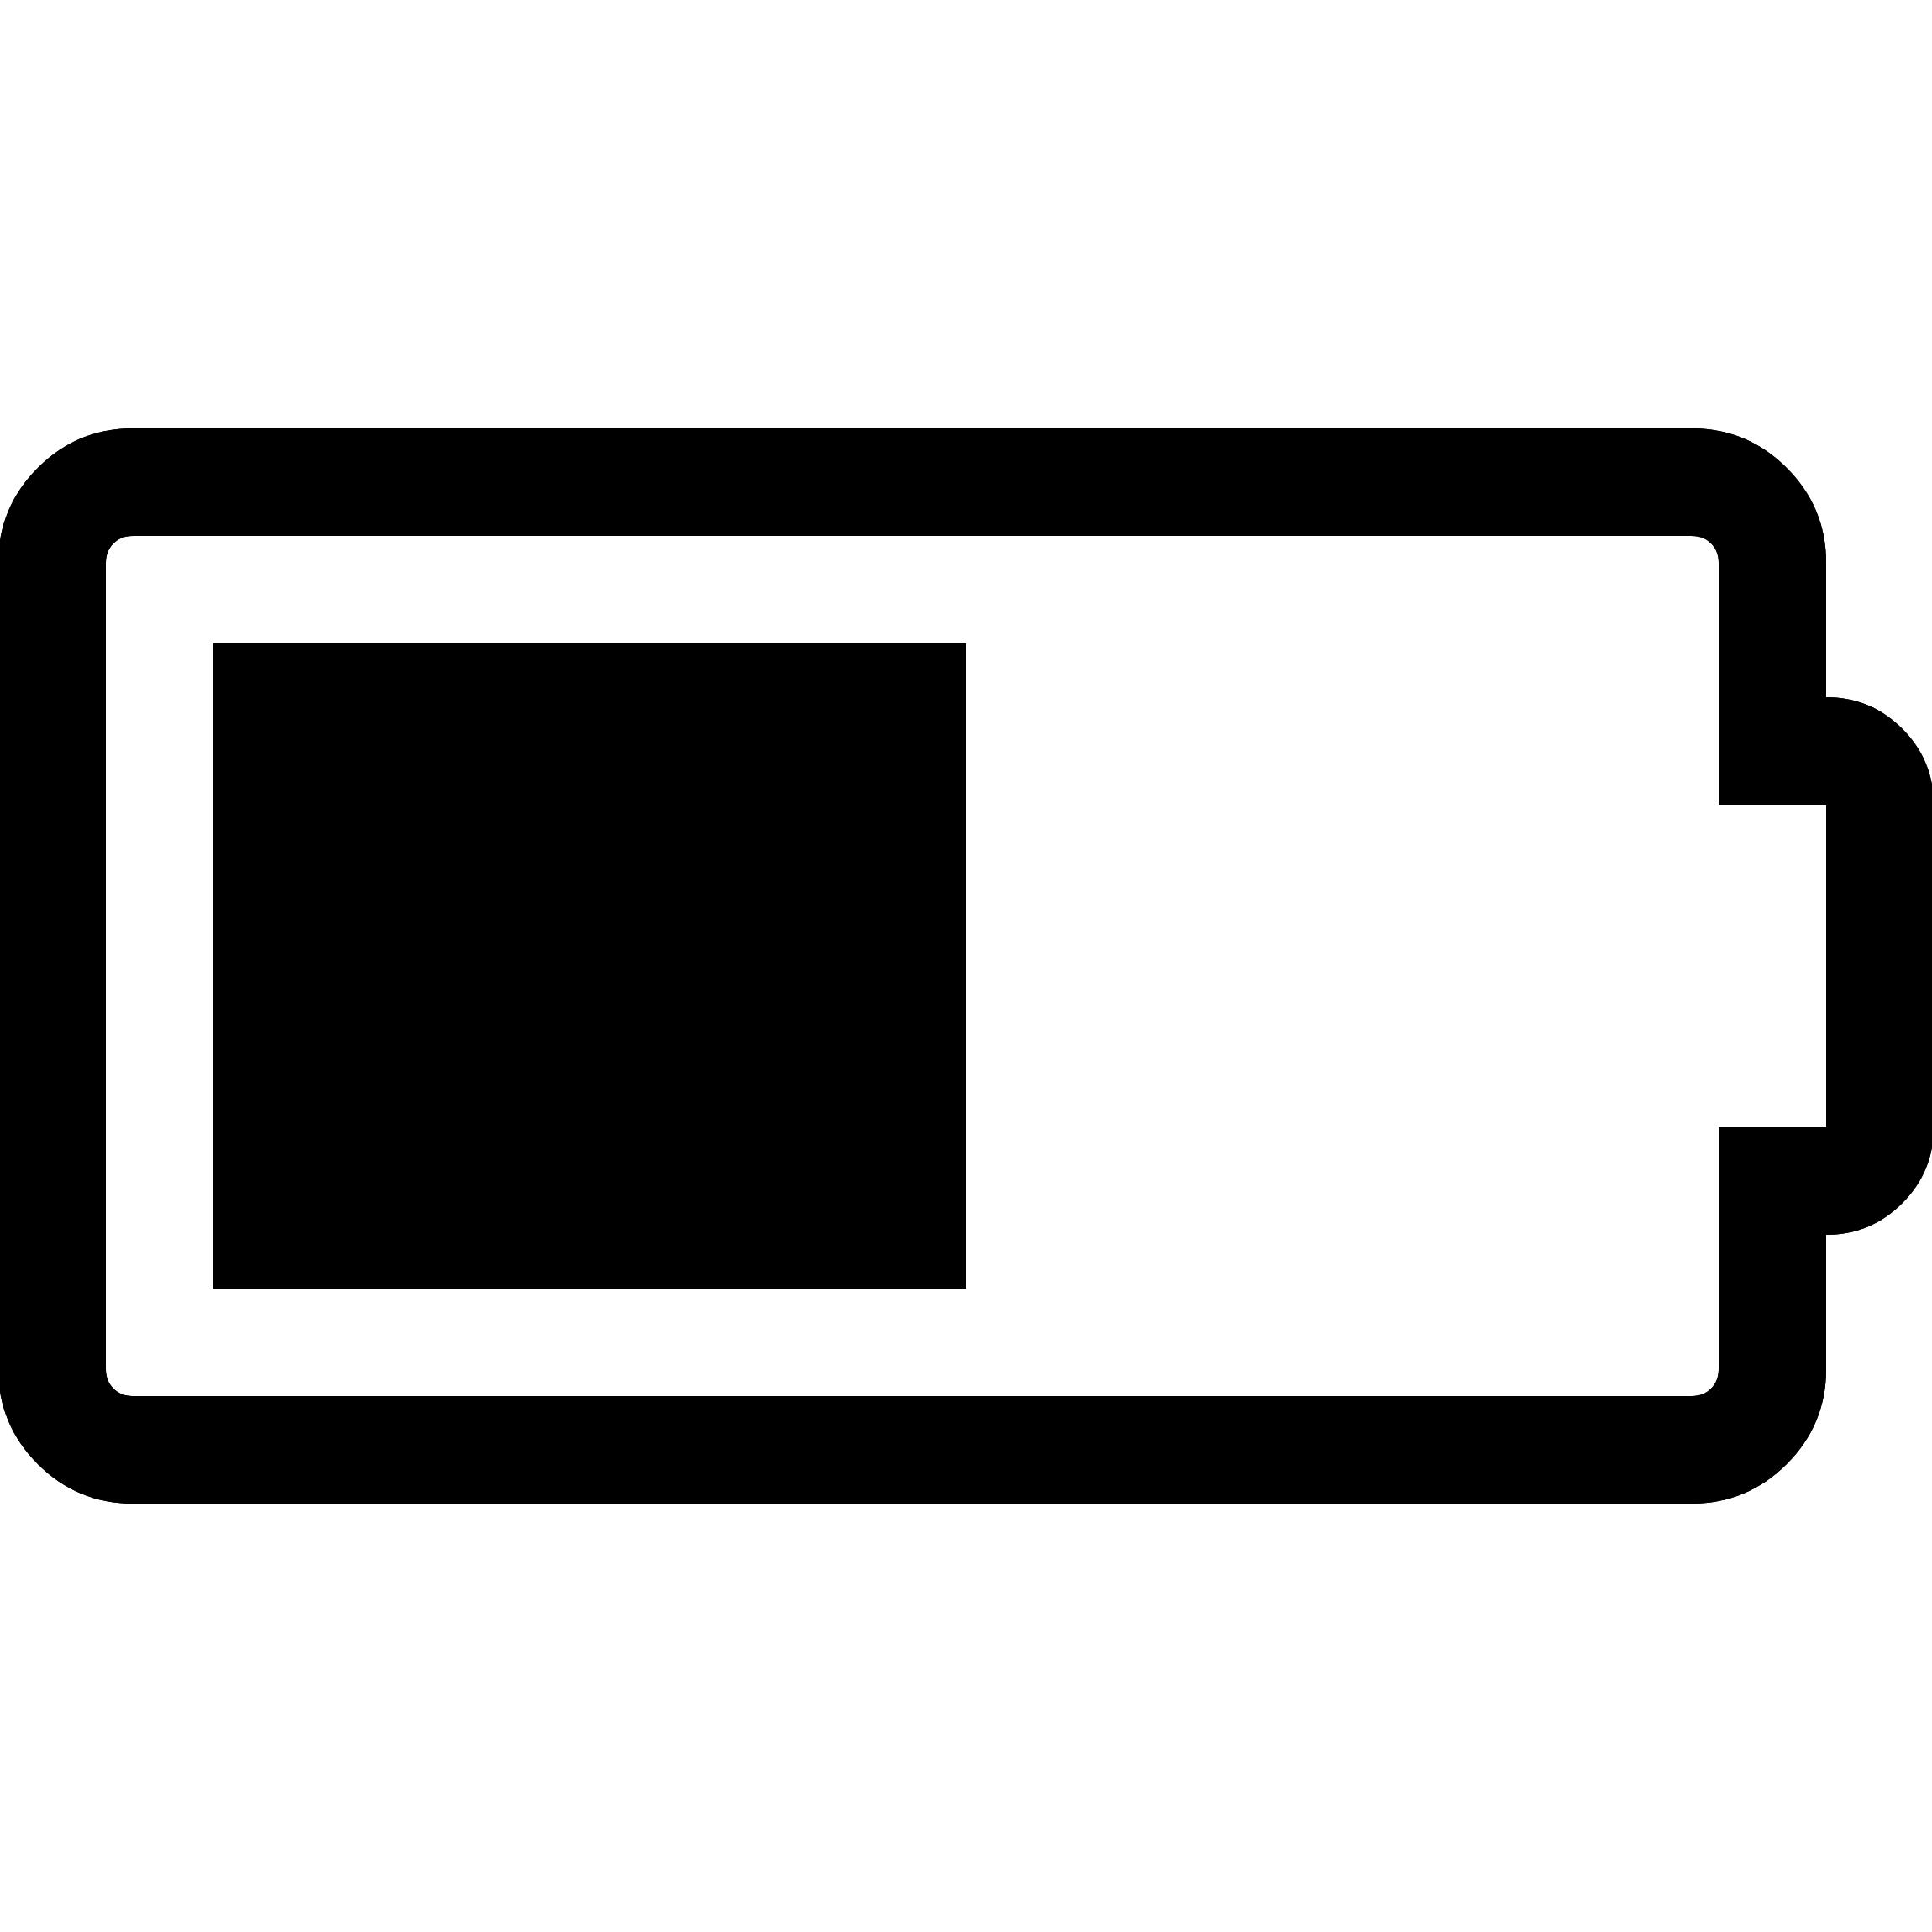 data/images/battery-half.png